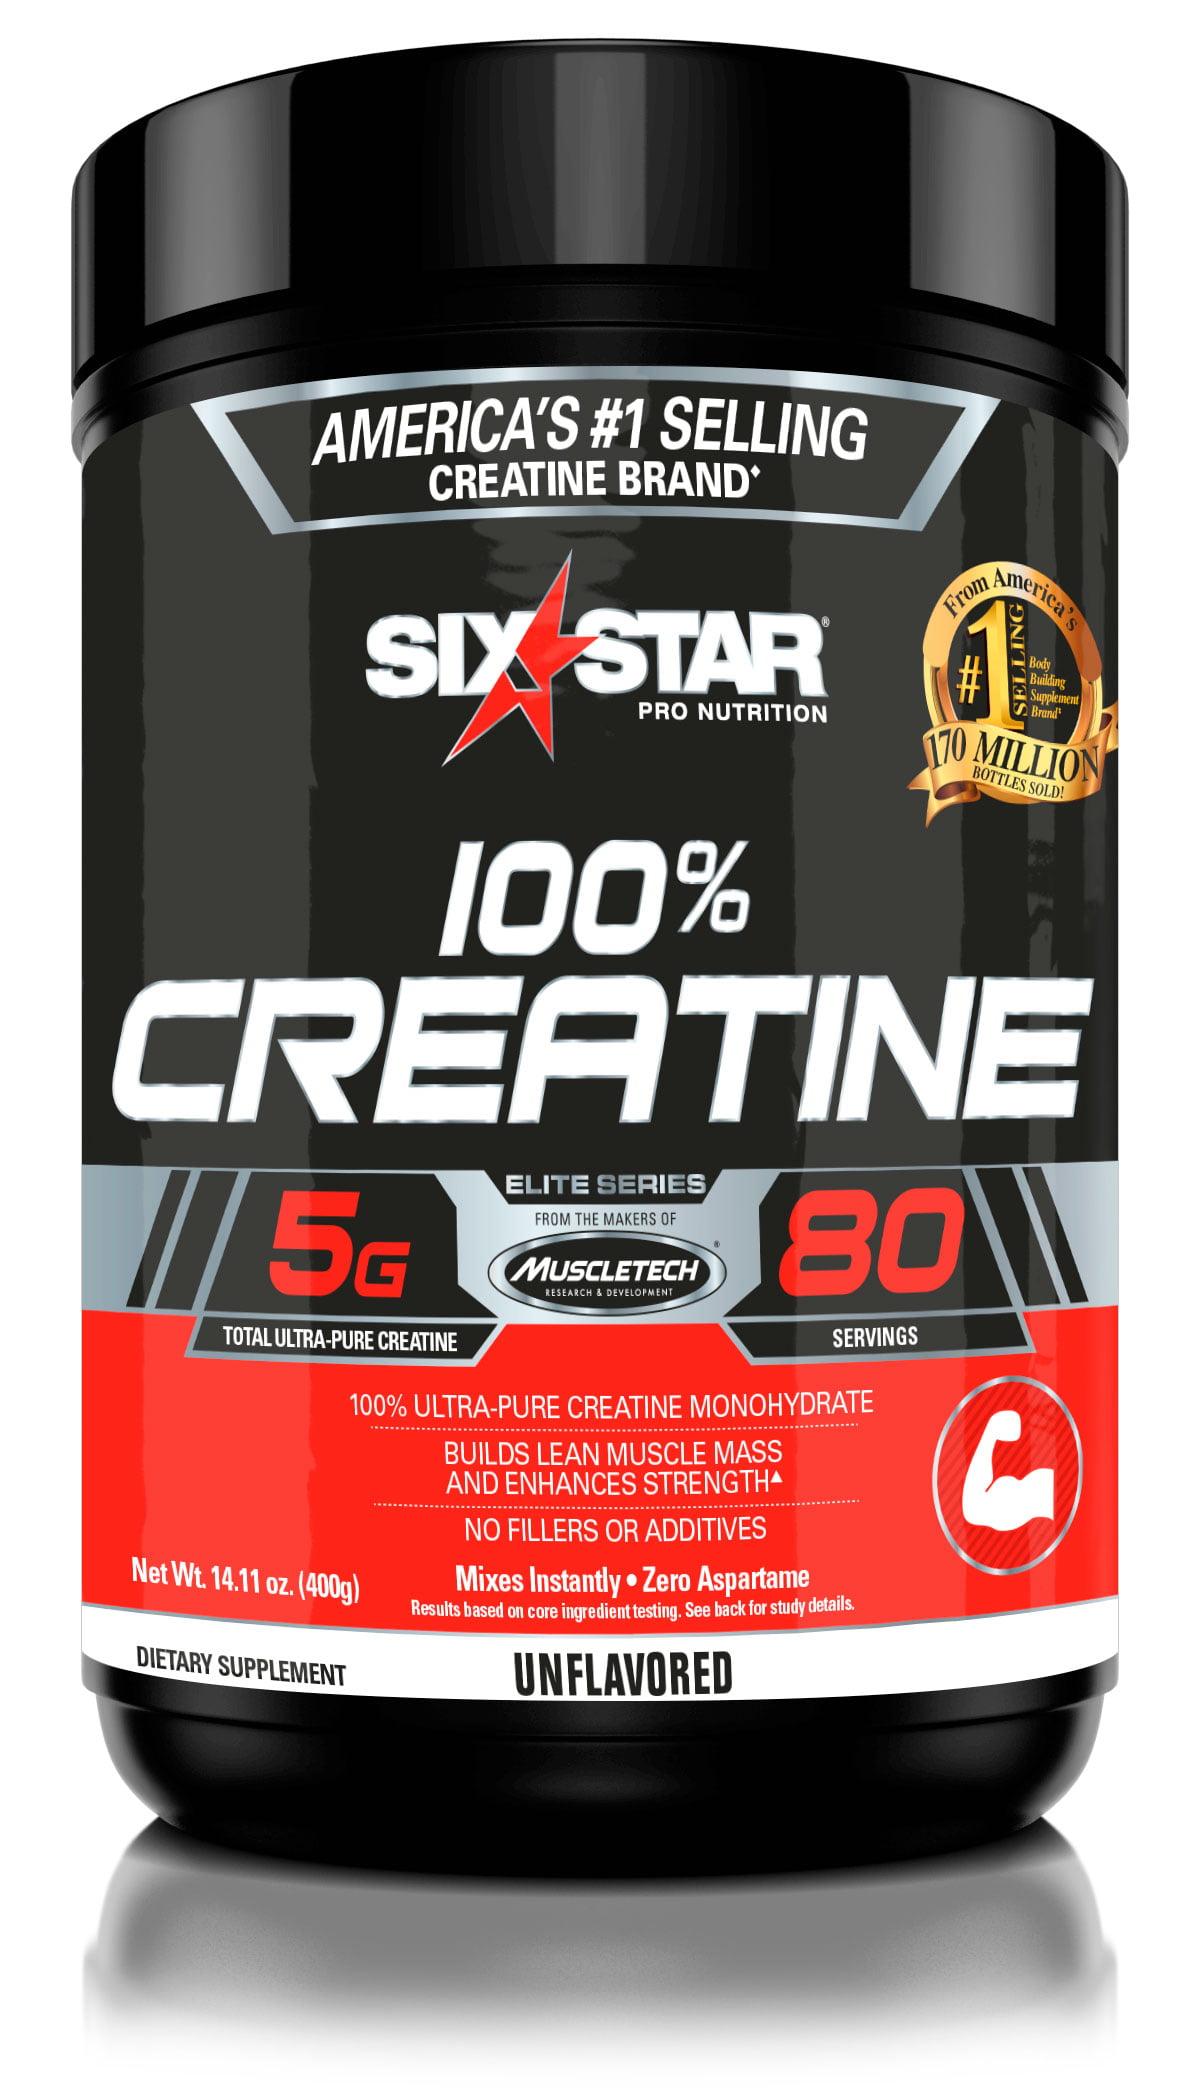 Six Star Pro Nutrition Elite Series Creatine Powder, 80 Servings -  Walmart.com